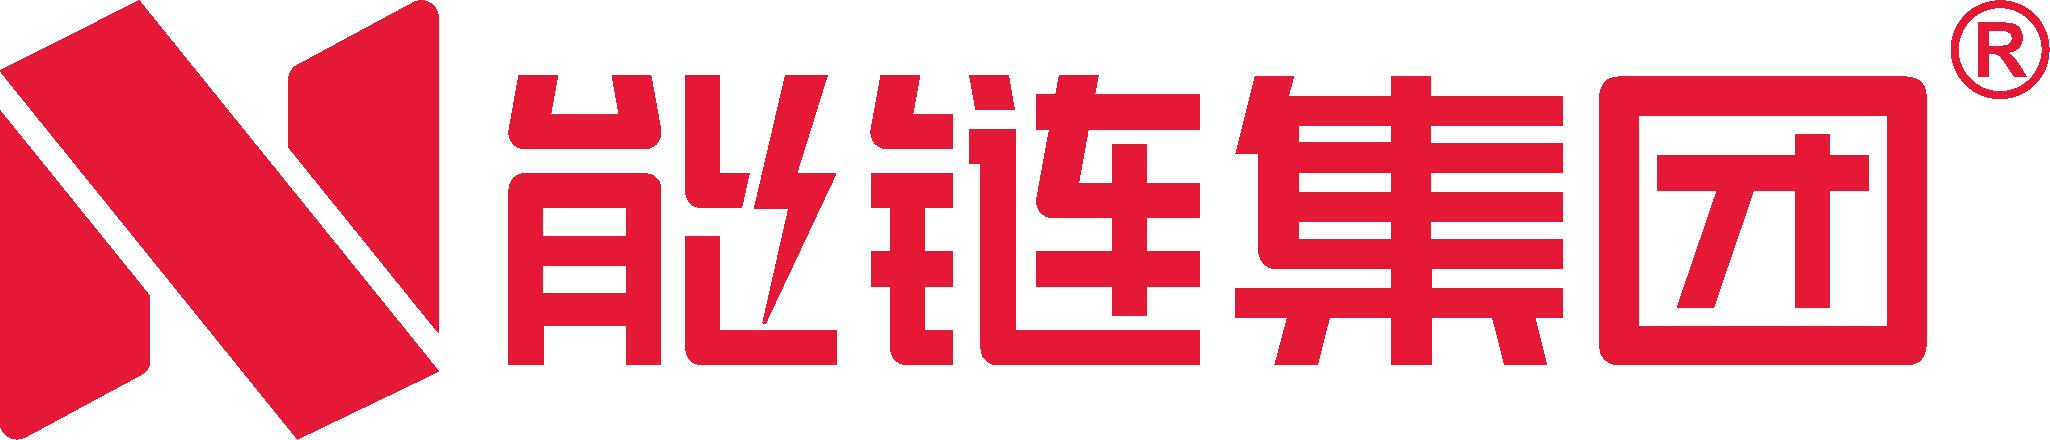 N 能链集团-02(1).png